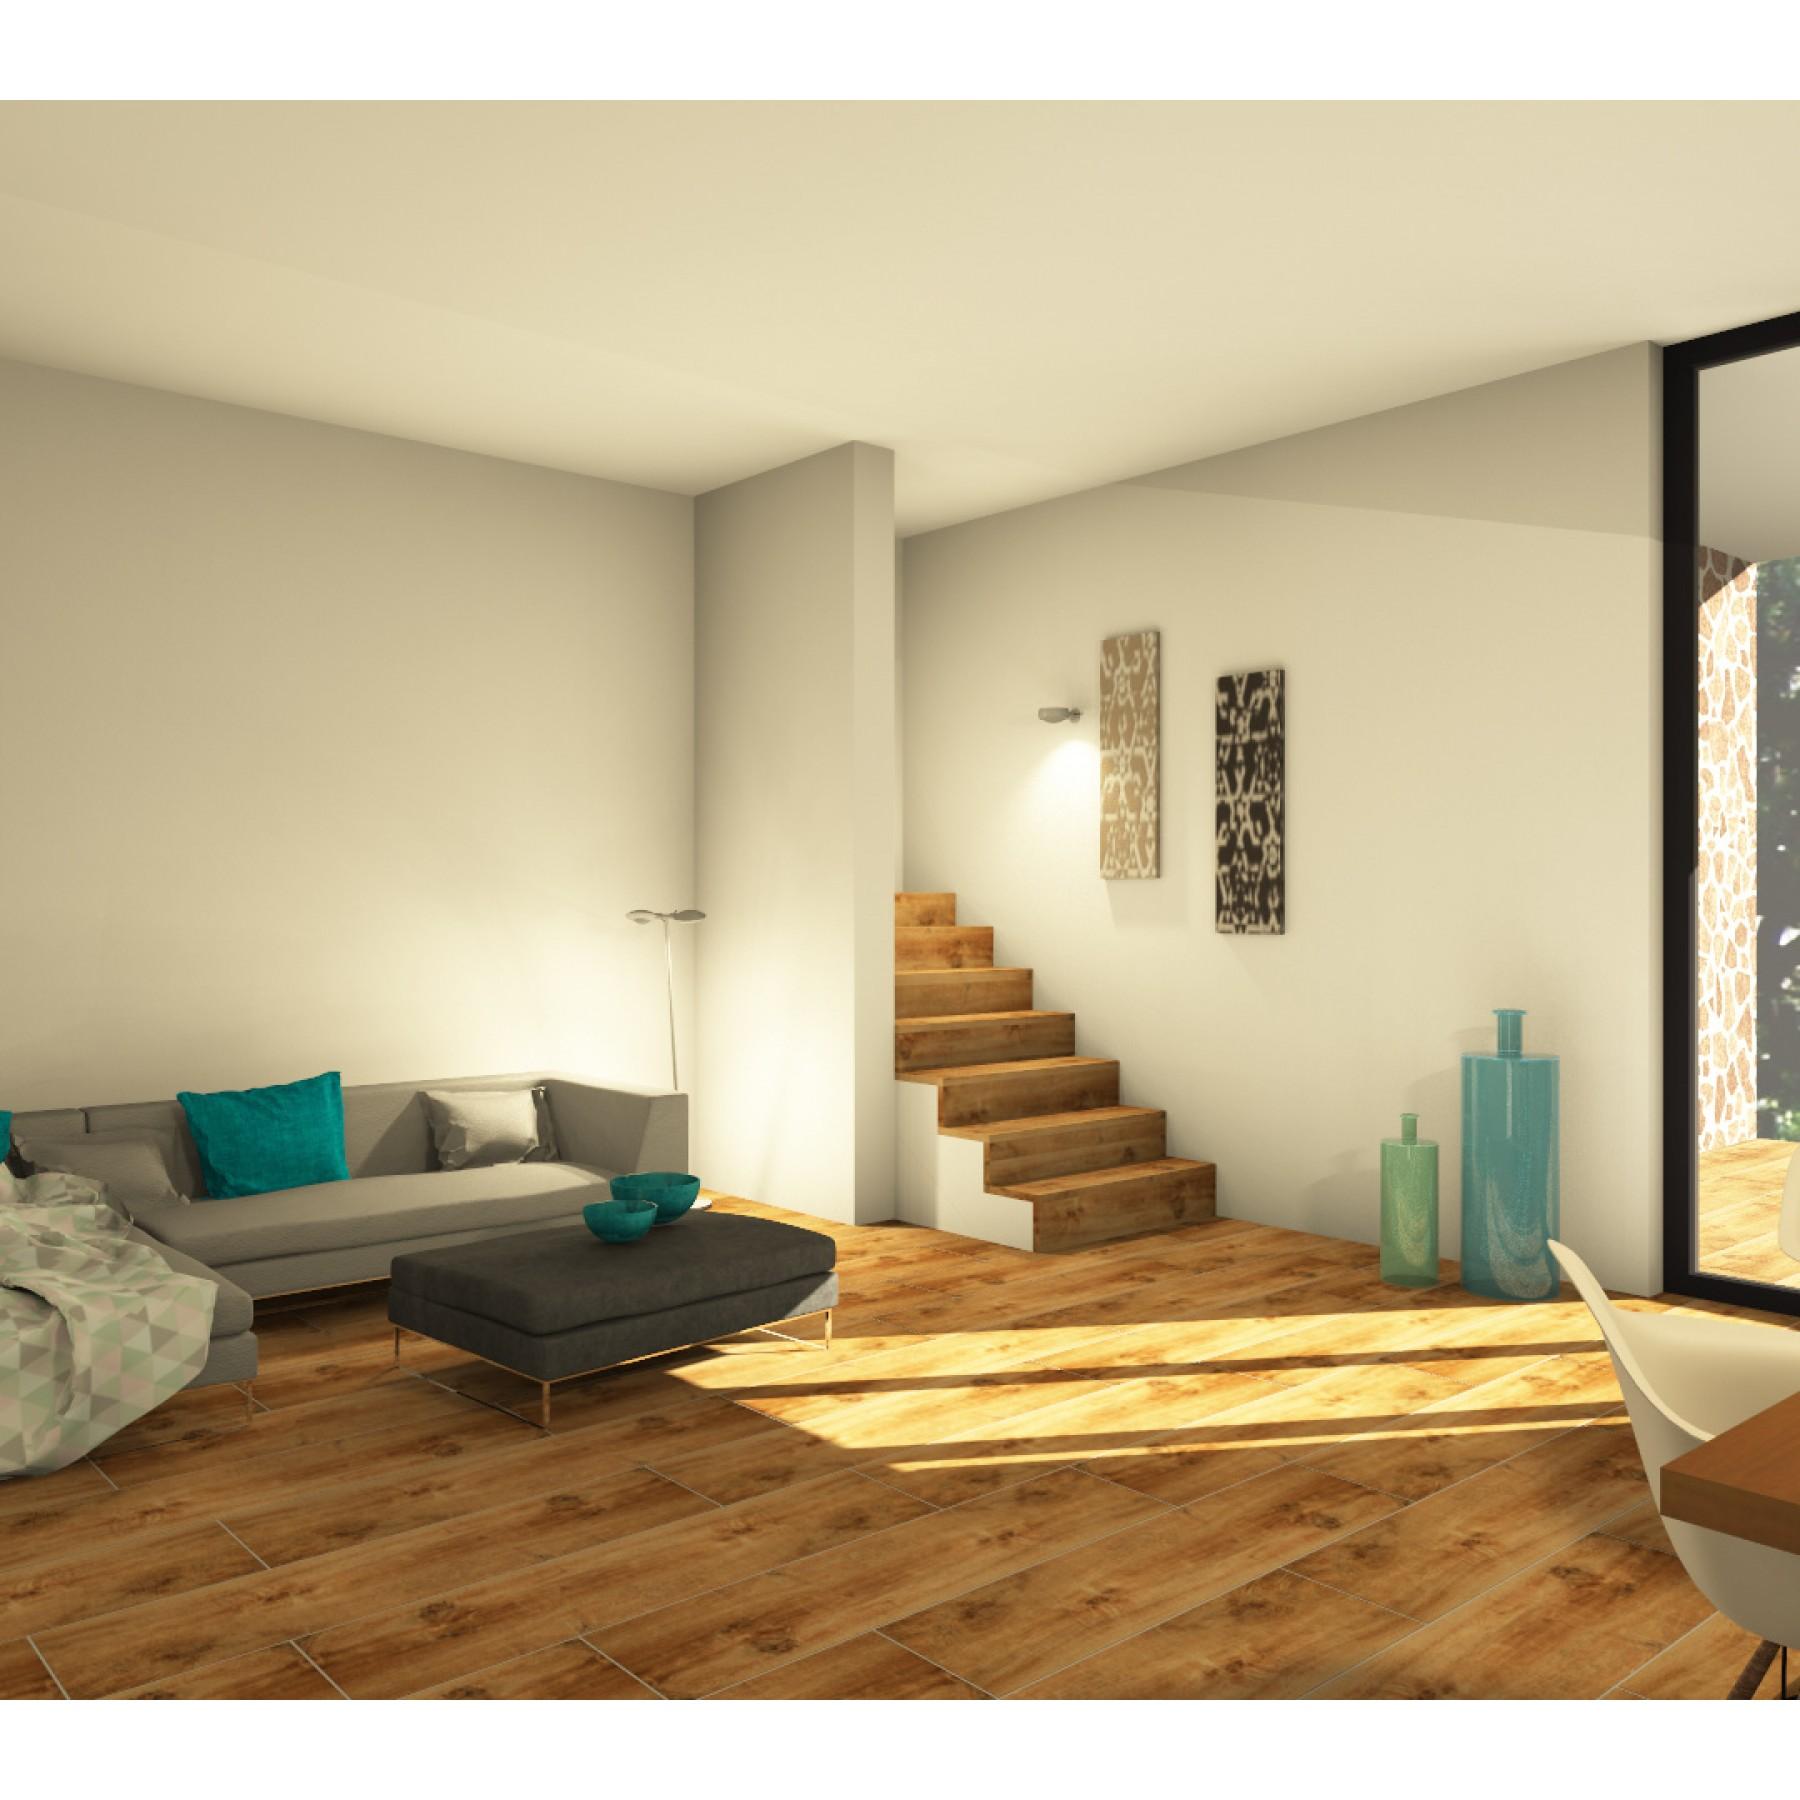 marazzi treverkhome larice 30x120cm italian kaakeli. Black Bedroom Furniture Sets. Home Design Ideas